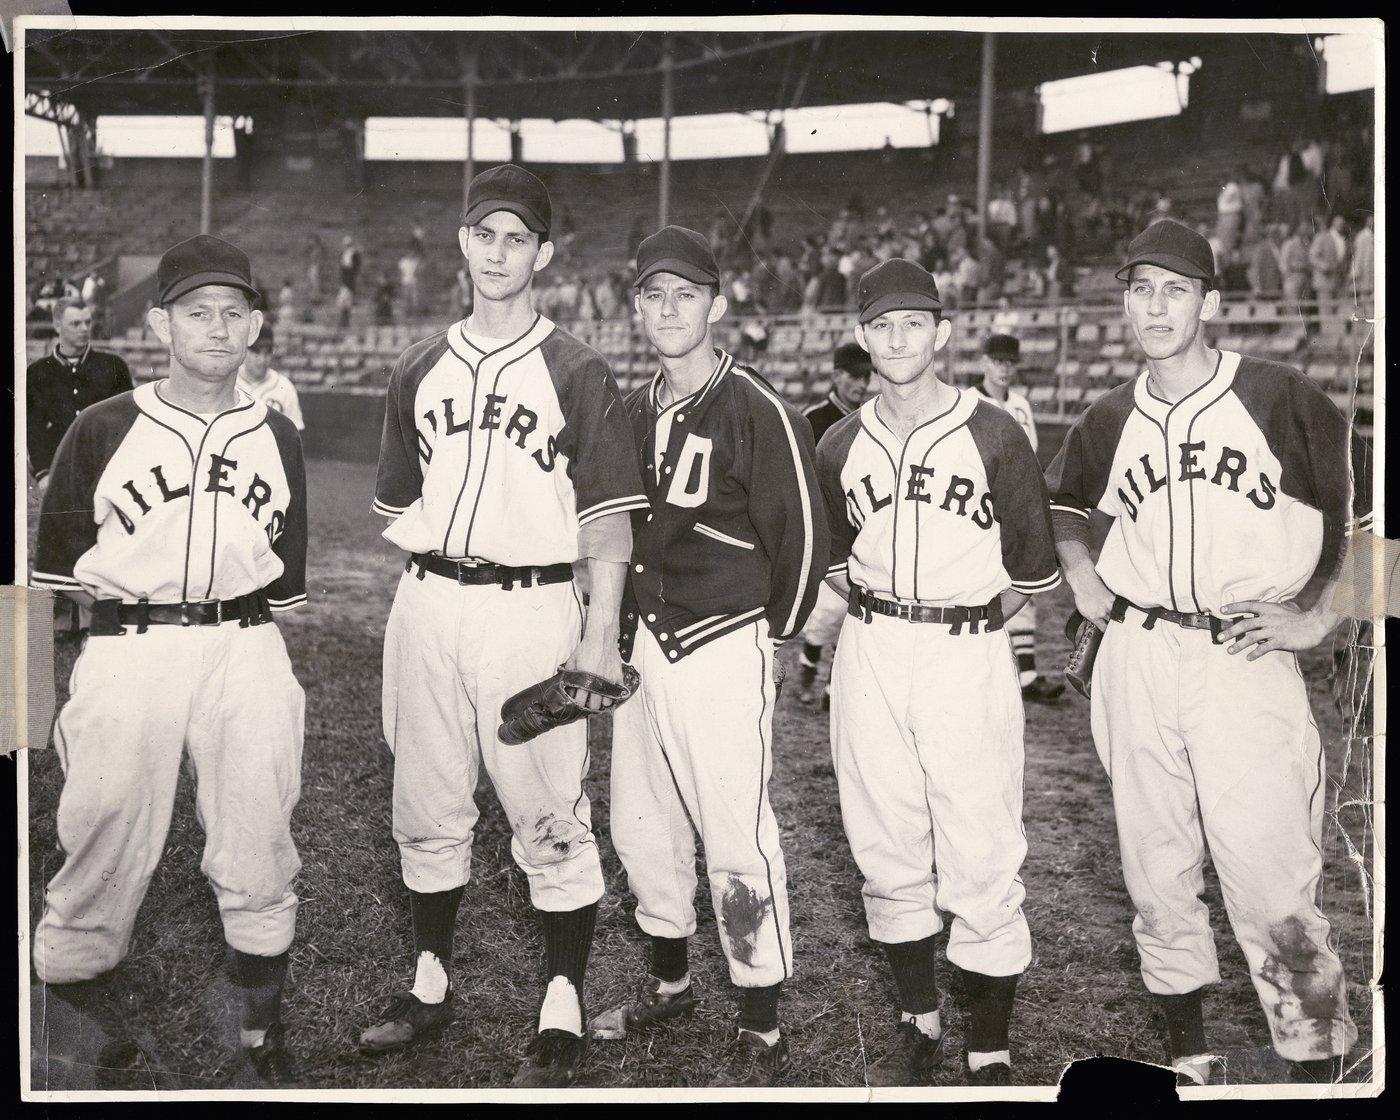 Coffman family members of the Topeka Decker Oilers baseball team